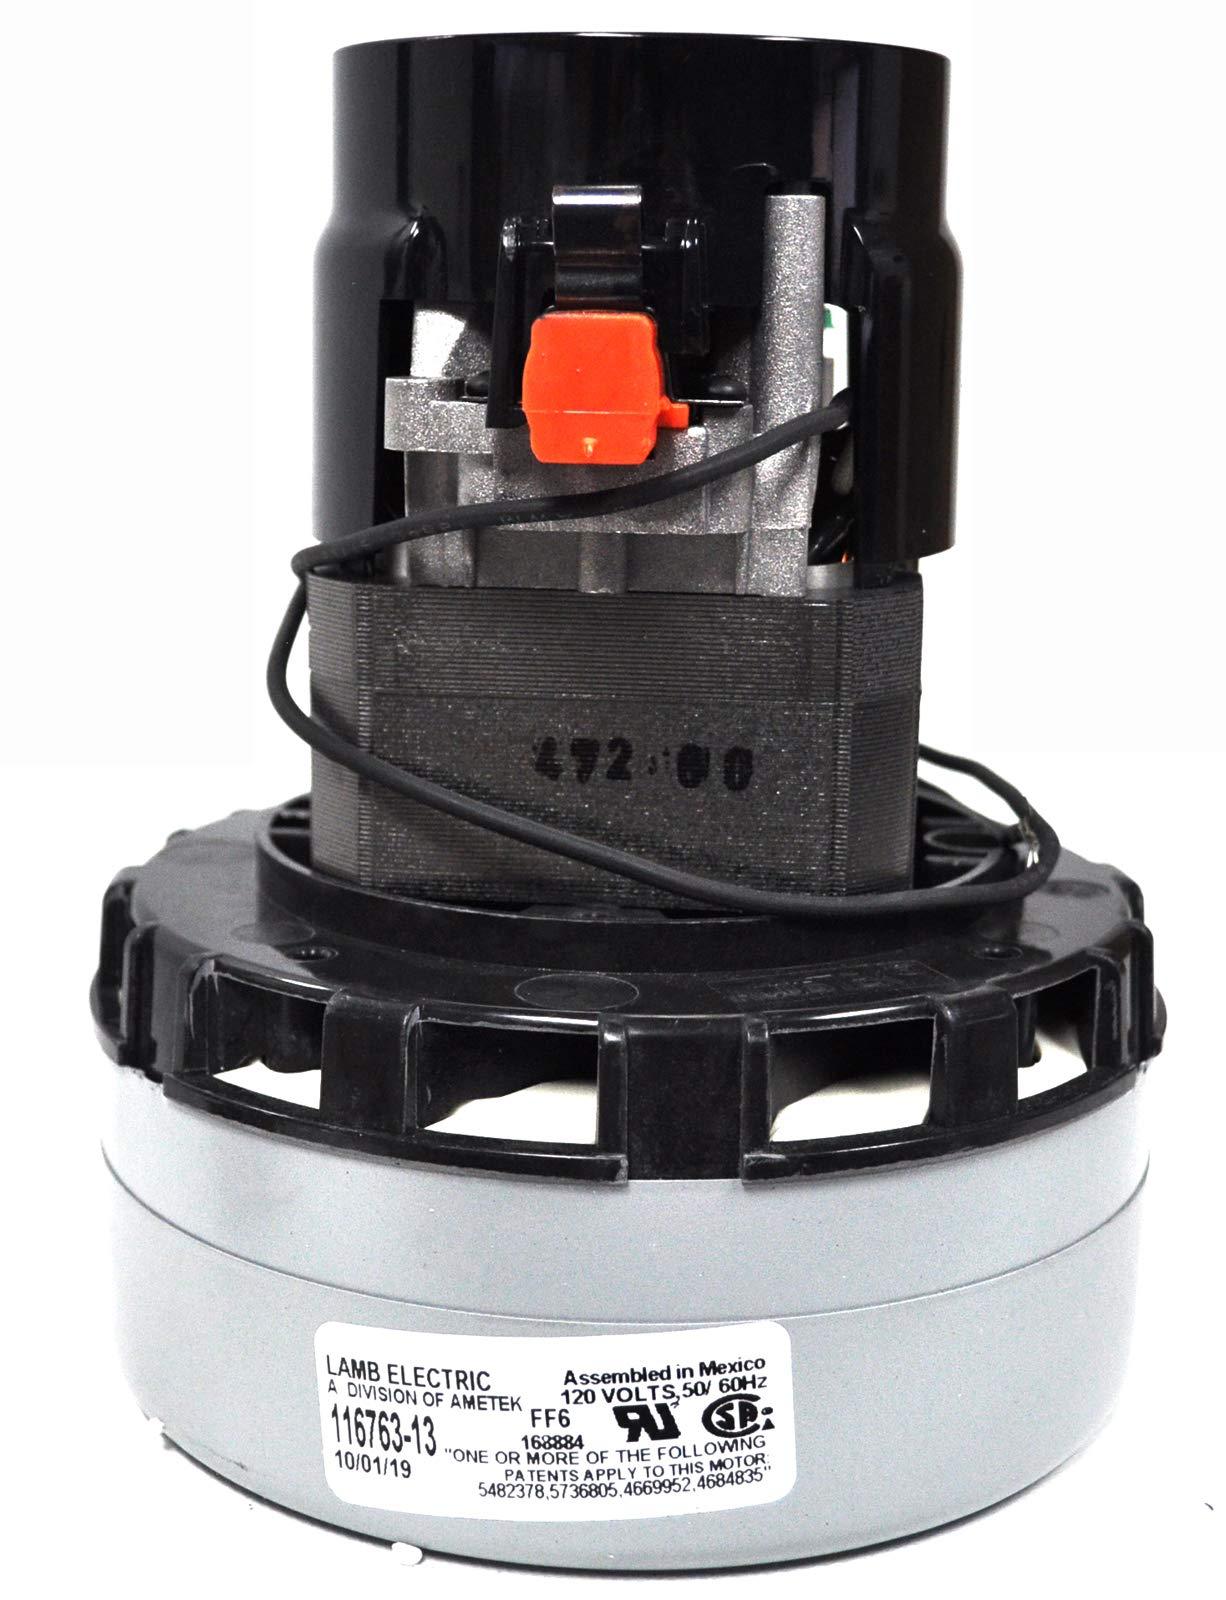 Ametek Lamb 5.7 Inch 2 Stage 120 Volt B/B Peripheral Bypass Motor 116763-13 by Ametek